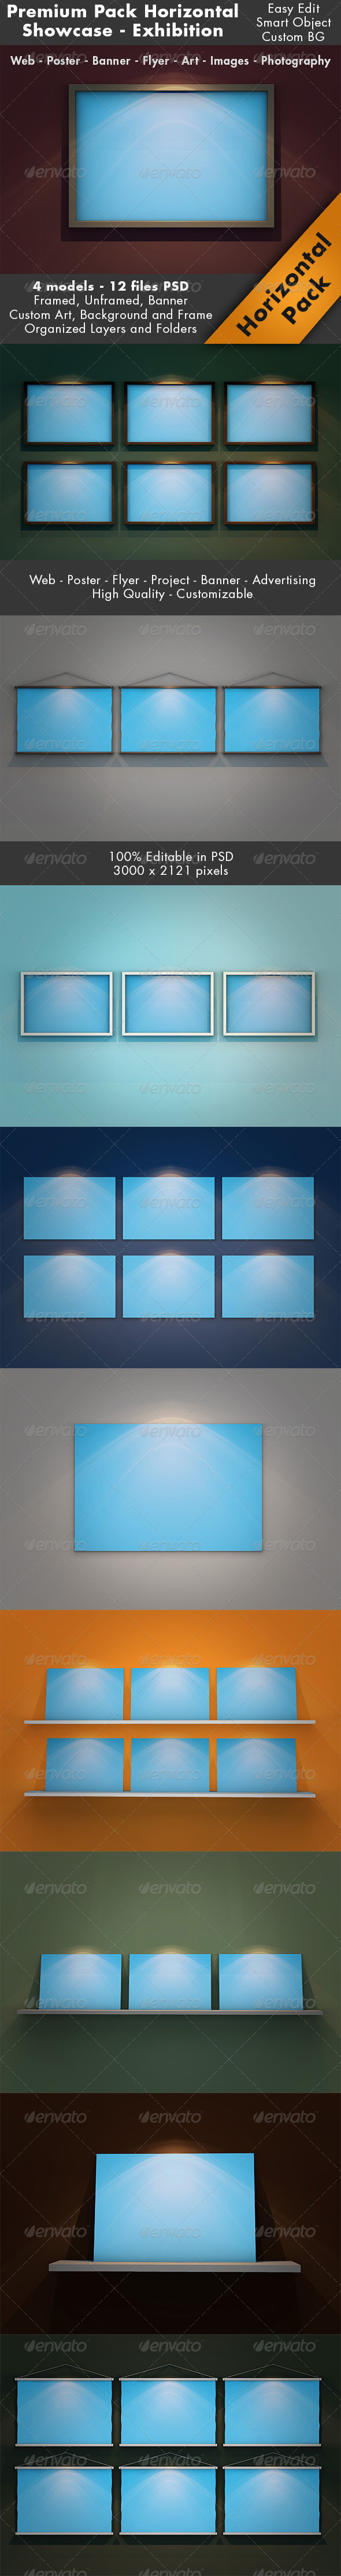 Horizontal Showcase Mockup Pack - Website Displays